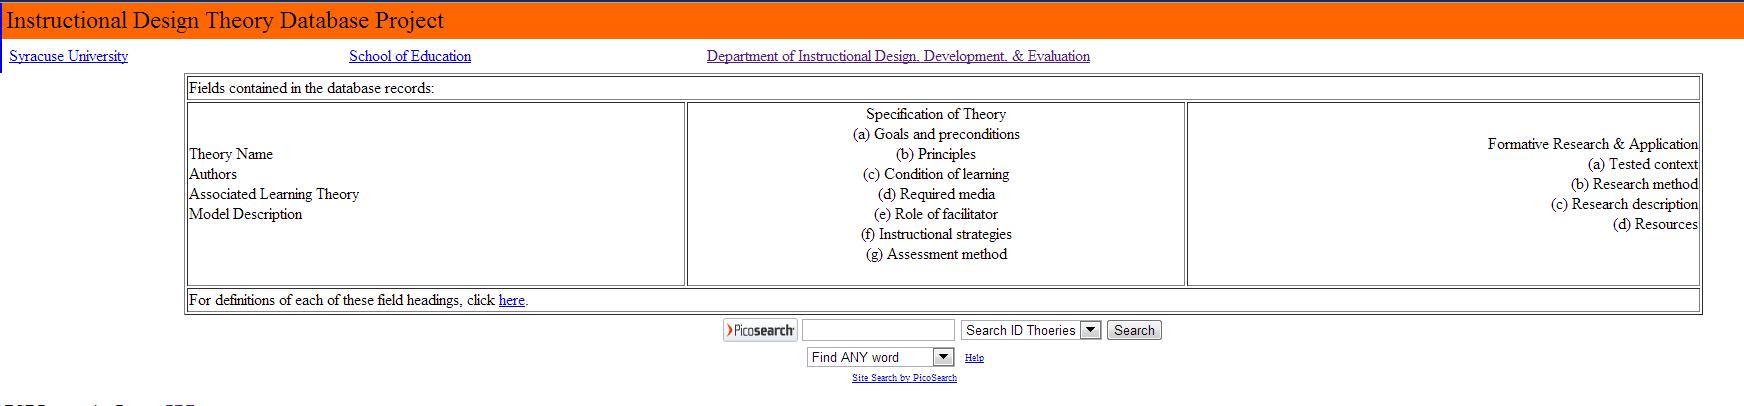 Instructional Design Theory Database Project Instructional Design